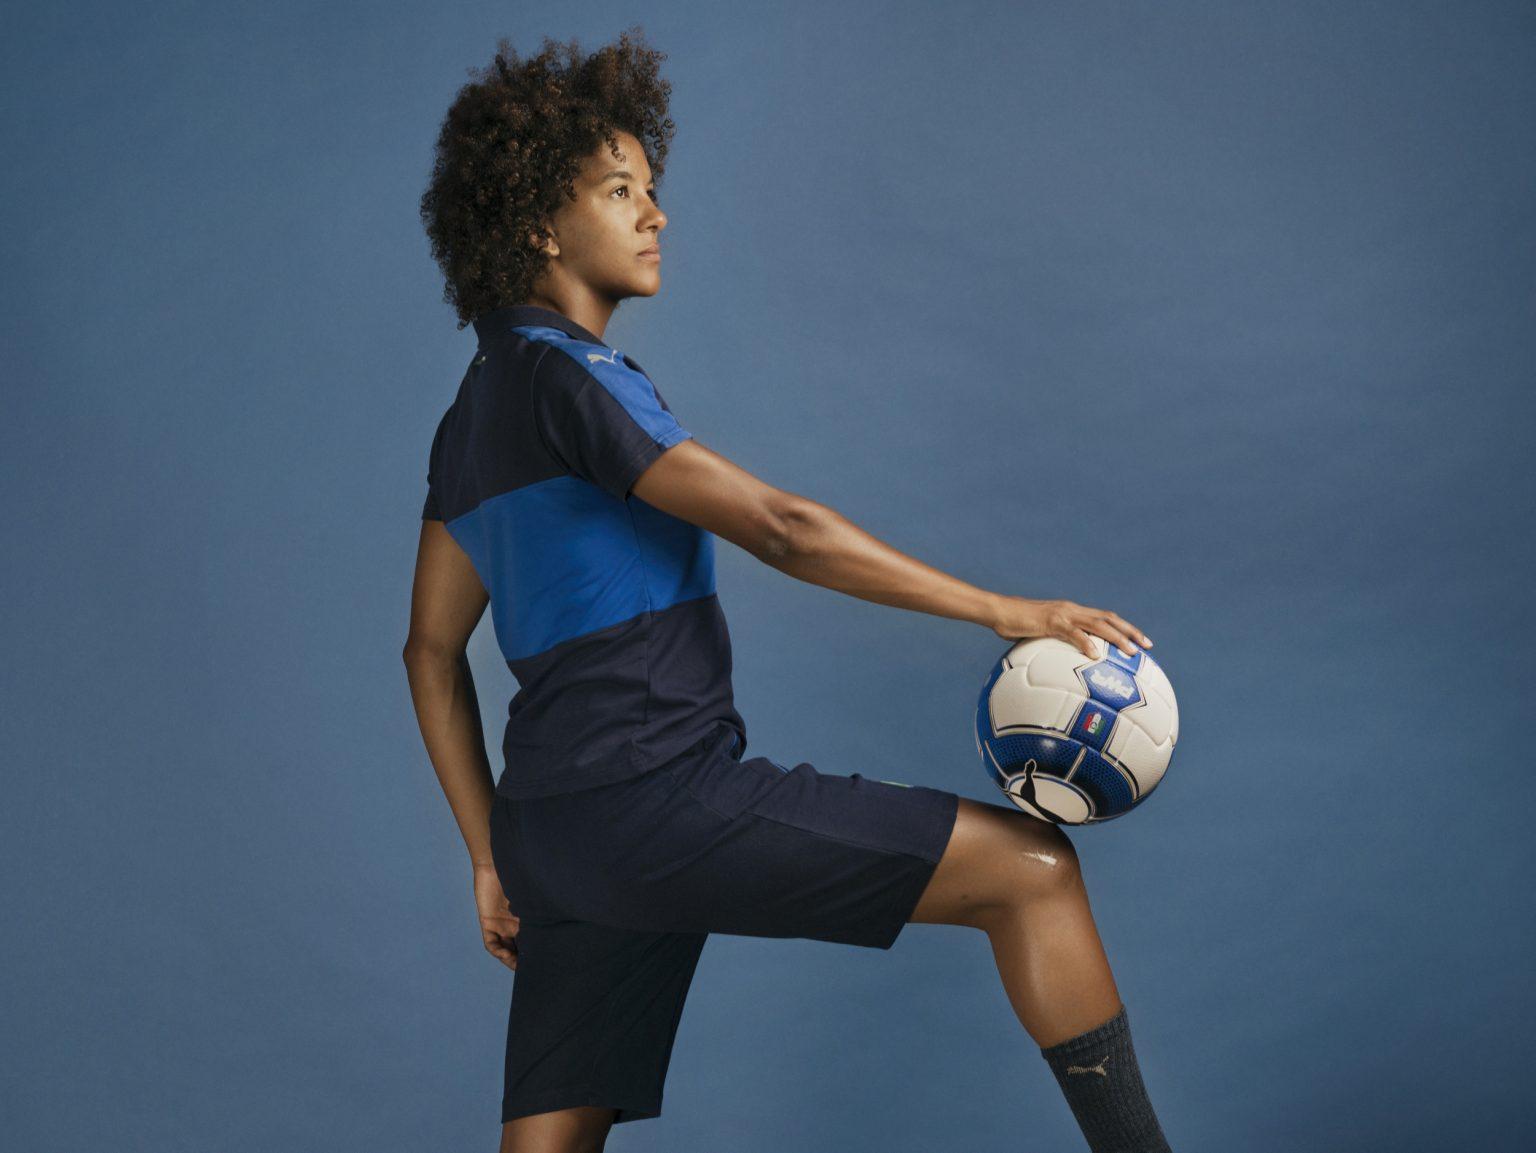 nazionale-femminile-di-calcio-sara-gama-italy-womens-national-team